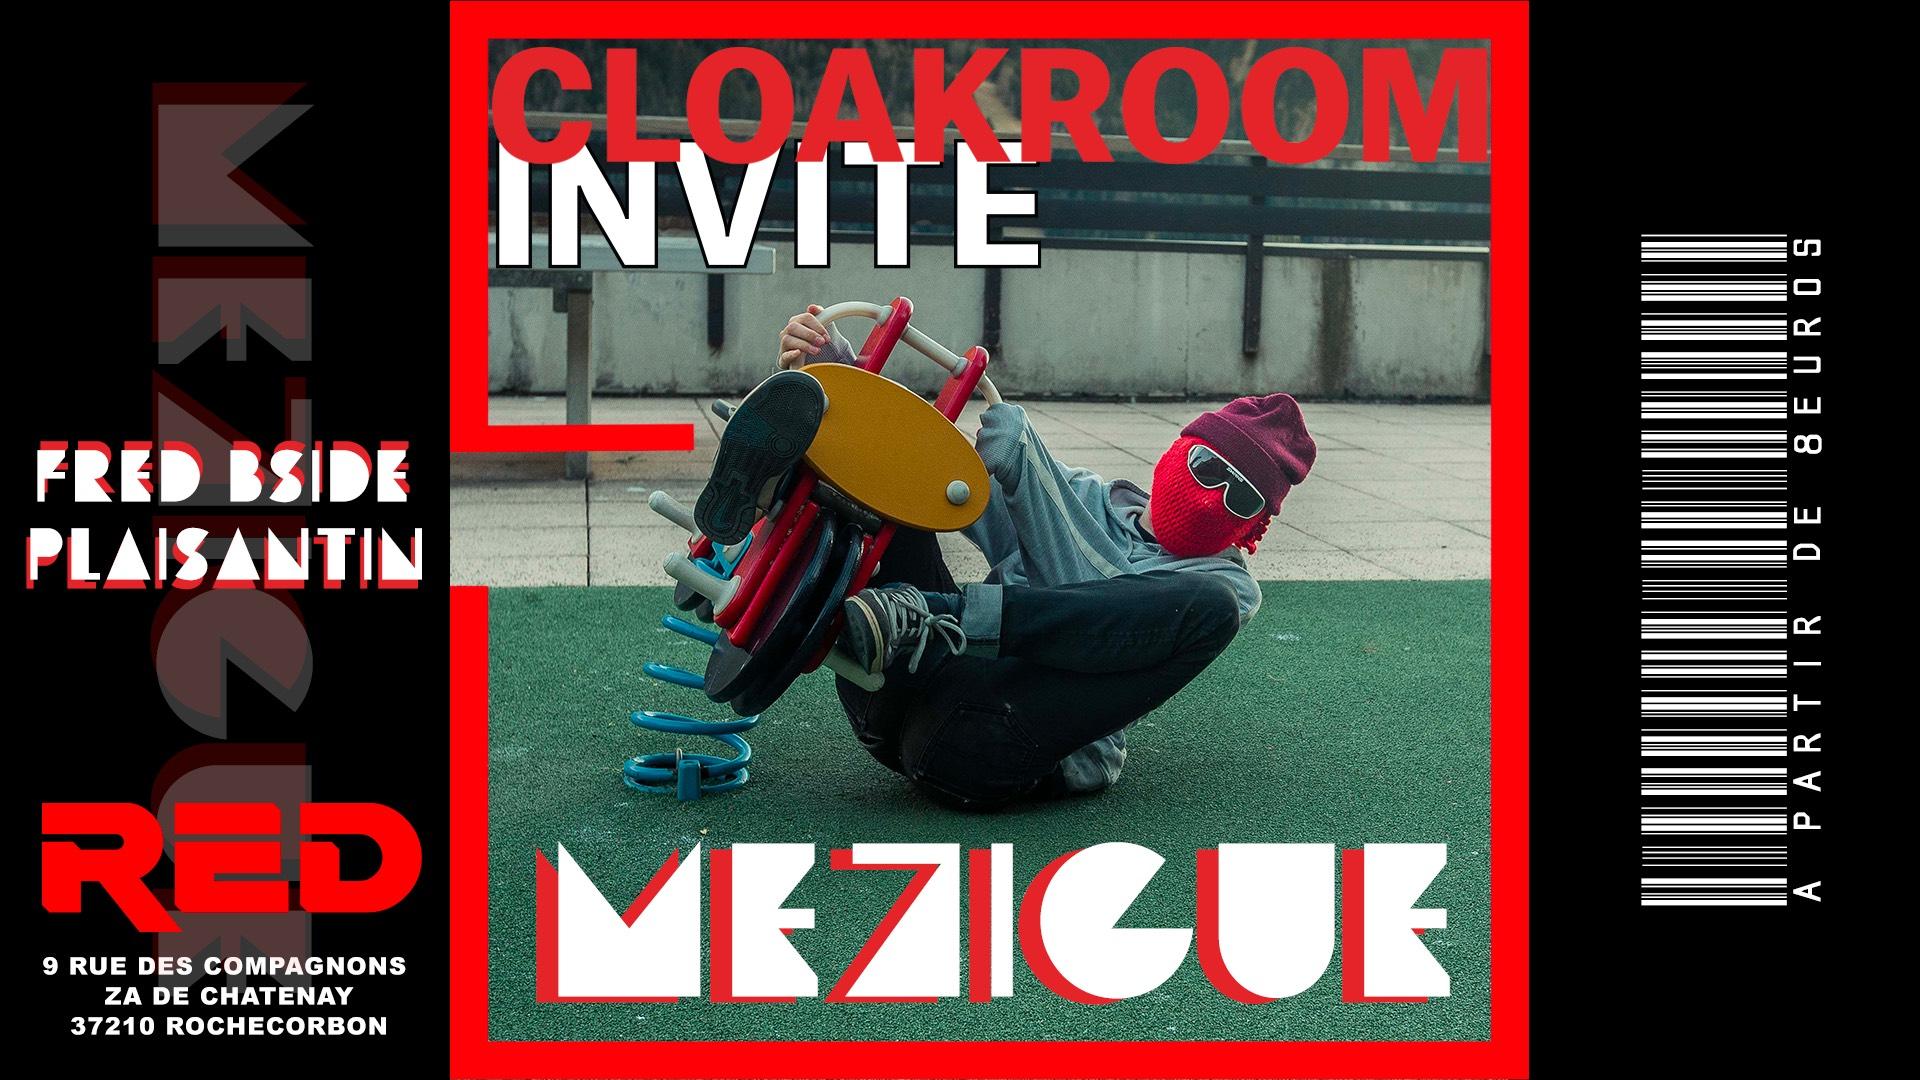 MEZIGUE RED CLUB